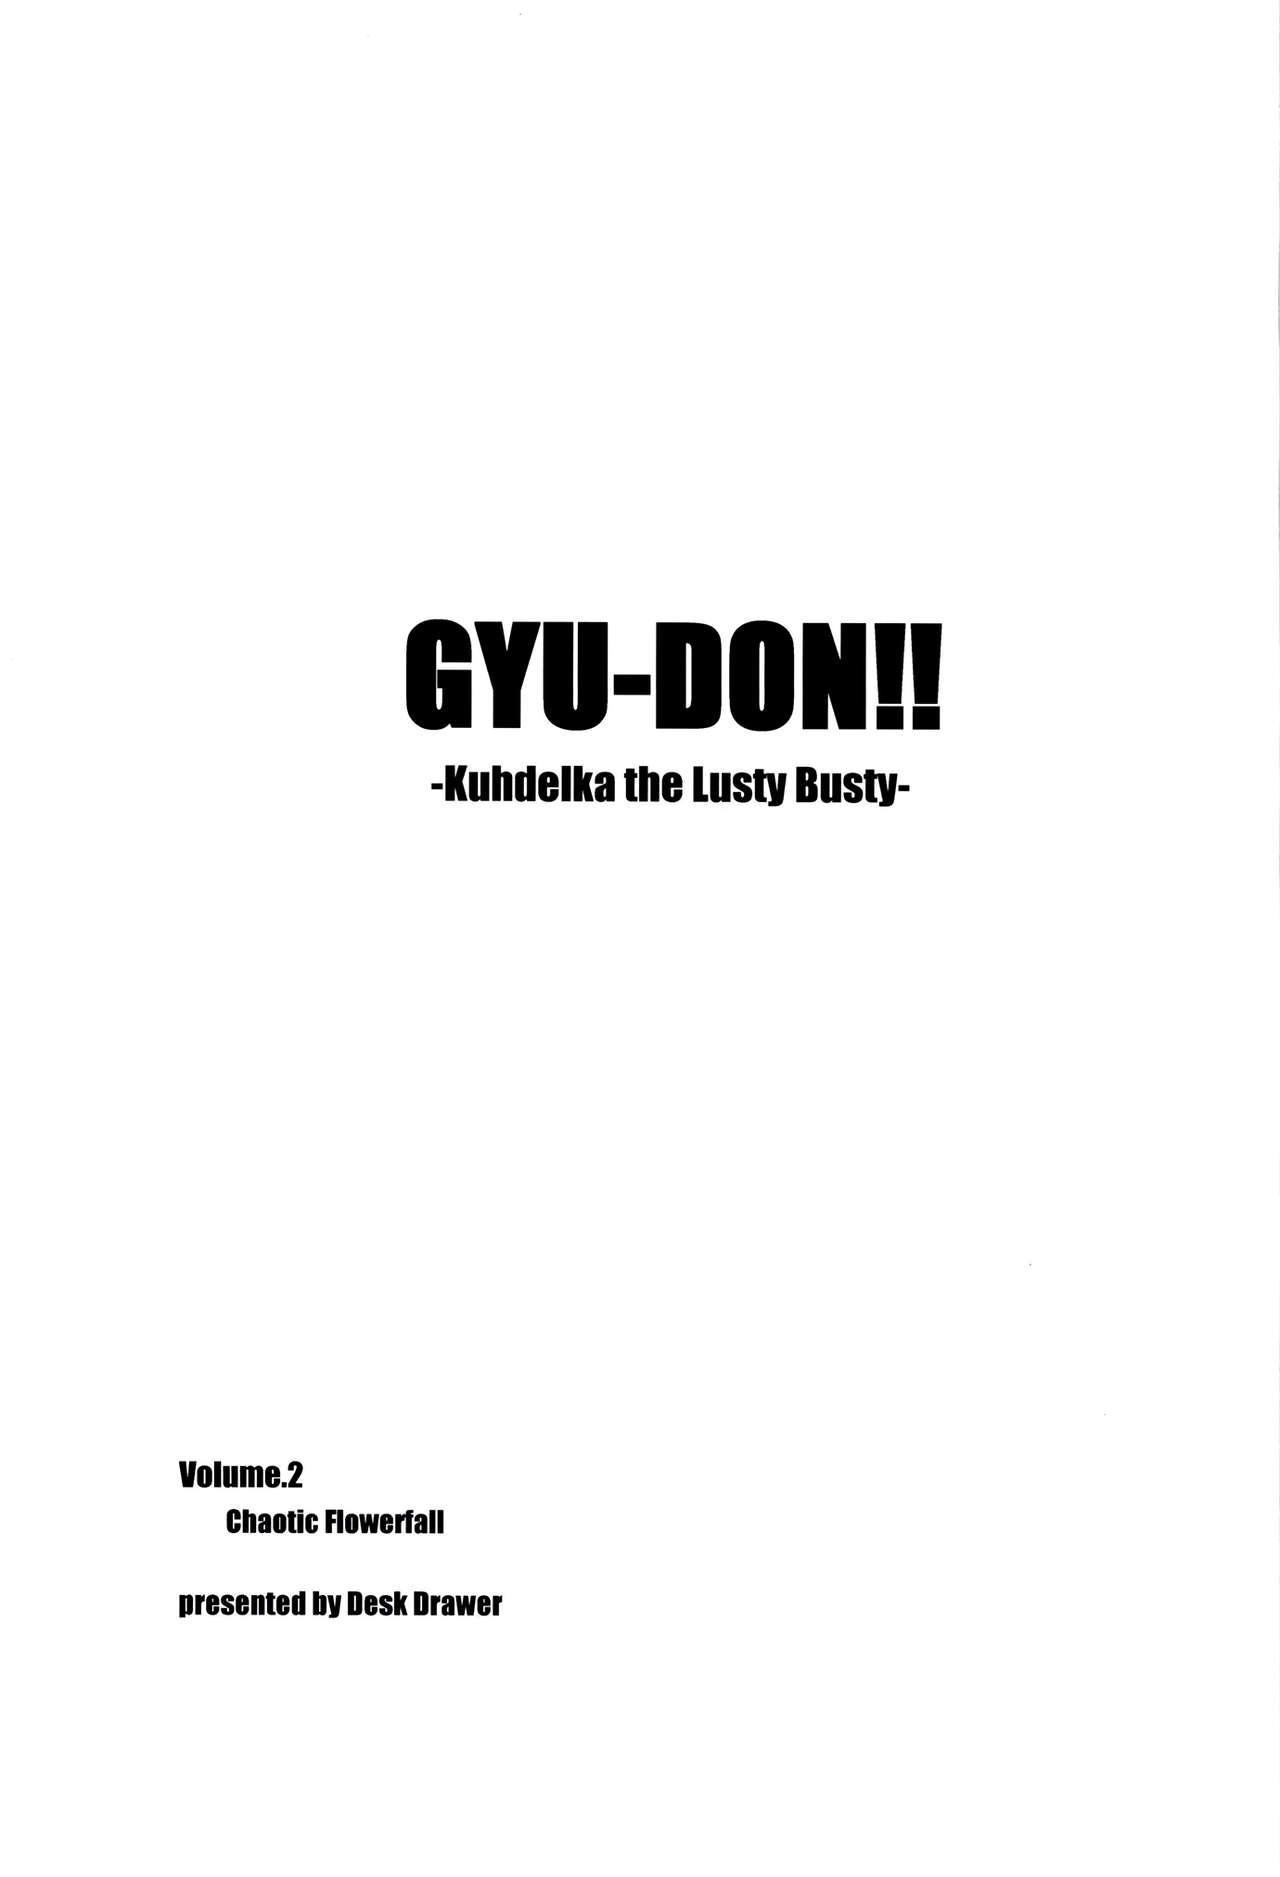 [Desk Drawer (Matsumoto Katsuya)] GYU-DON!! 2 -Chaotic Flowerfall [Digital] 2